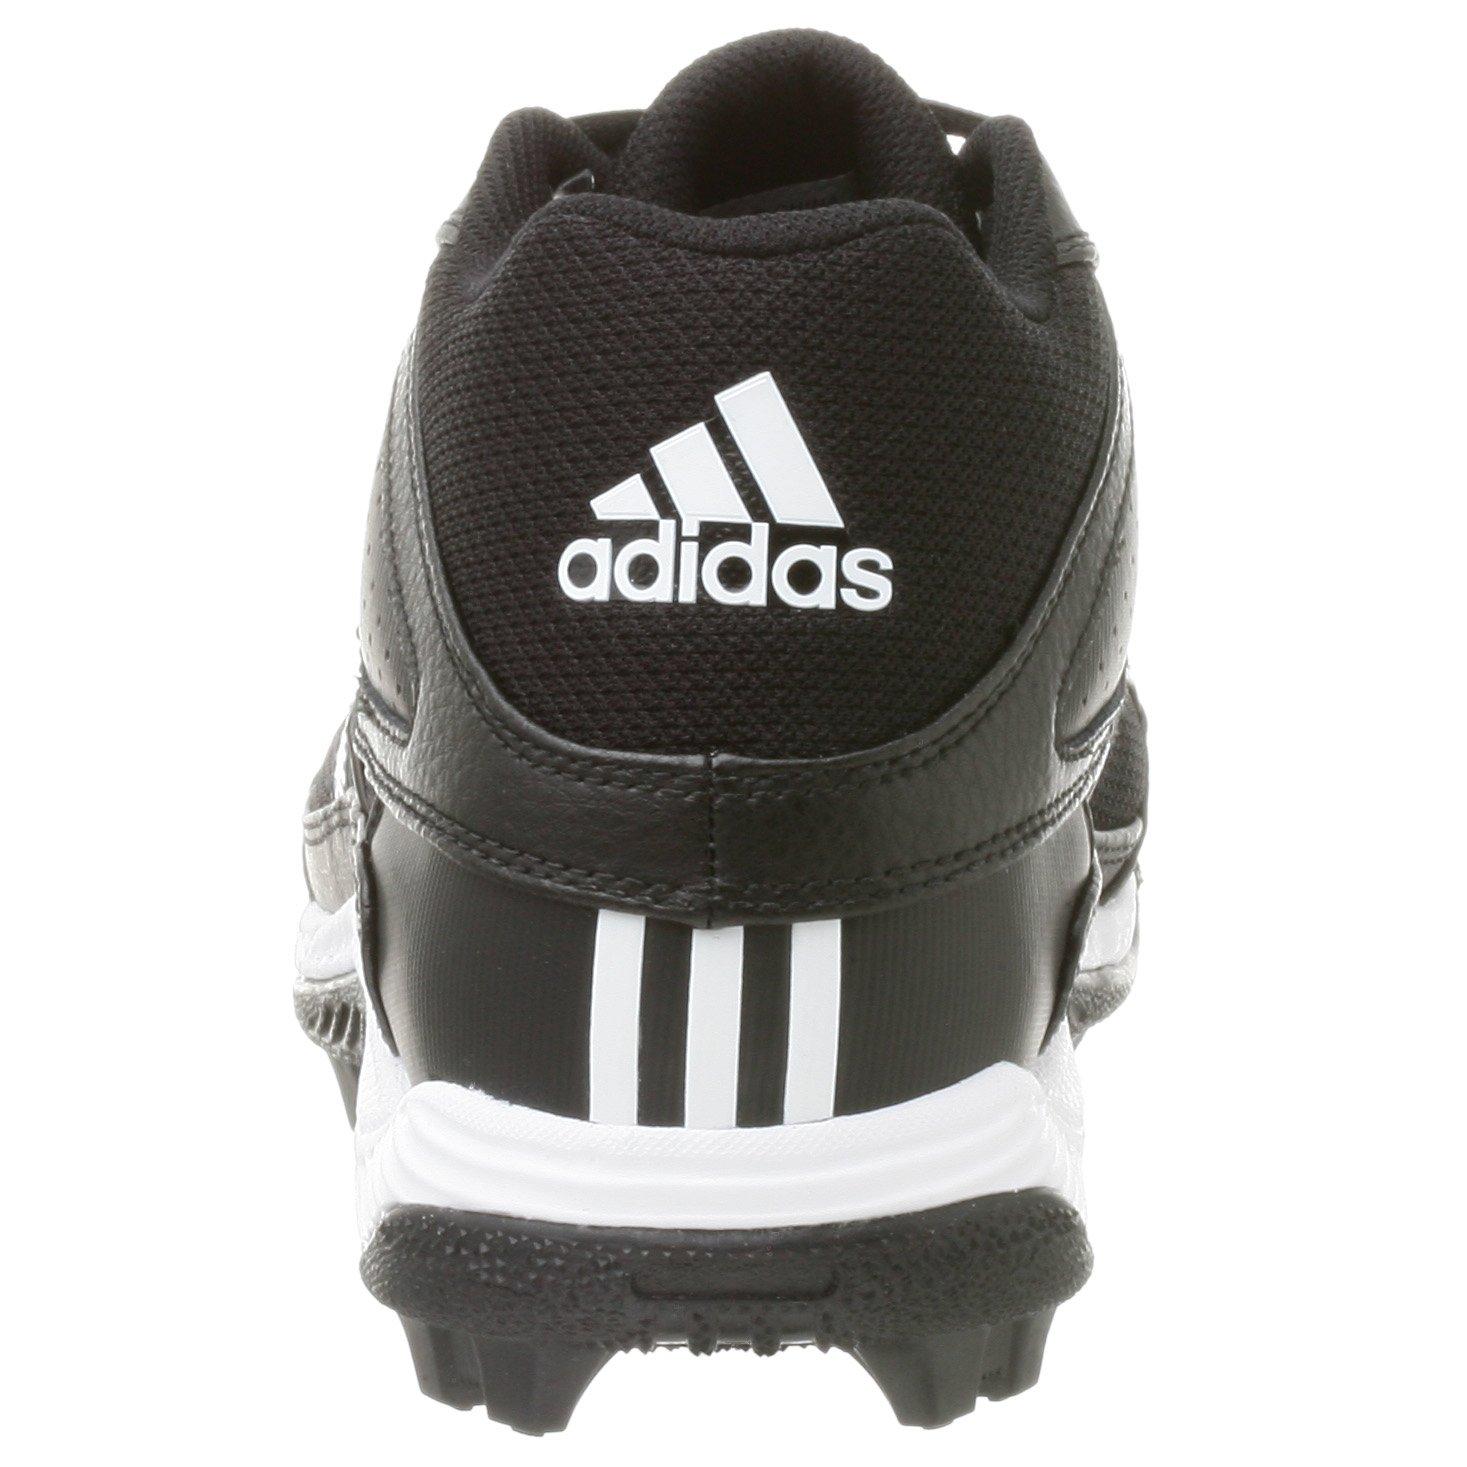 Adidas Corner Blitz Blitz Blitz 7 Md Low, schwarz   runwht   METSIL, 8 M eac9ad